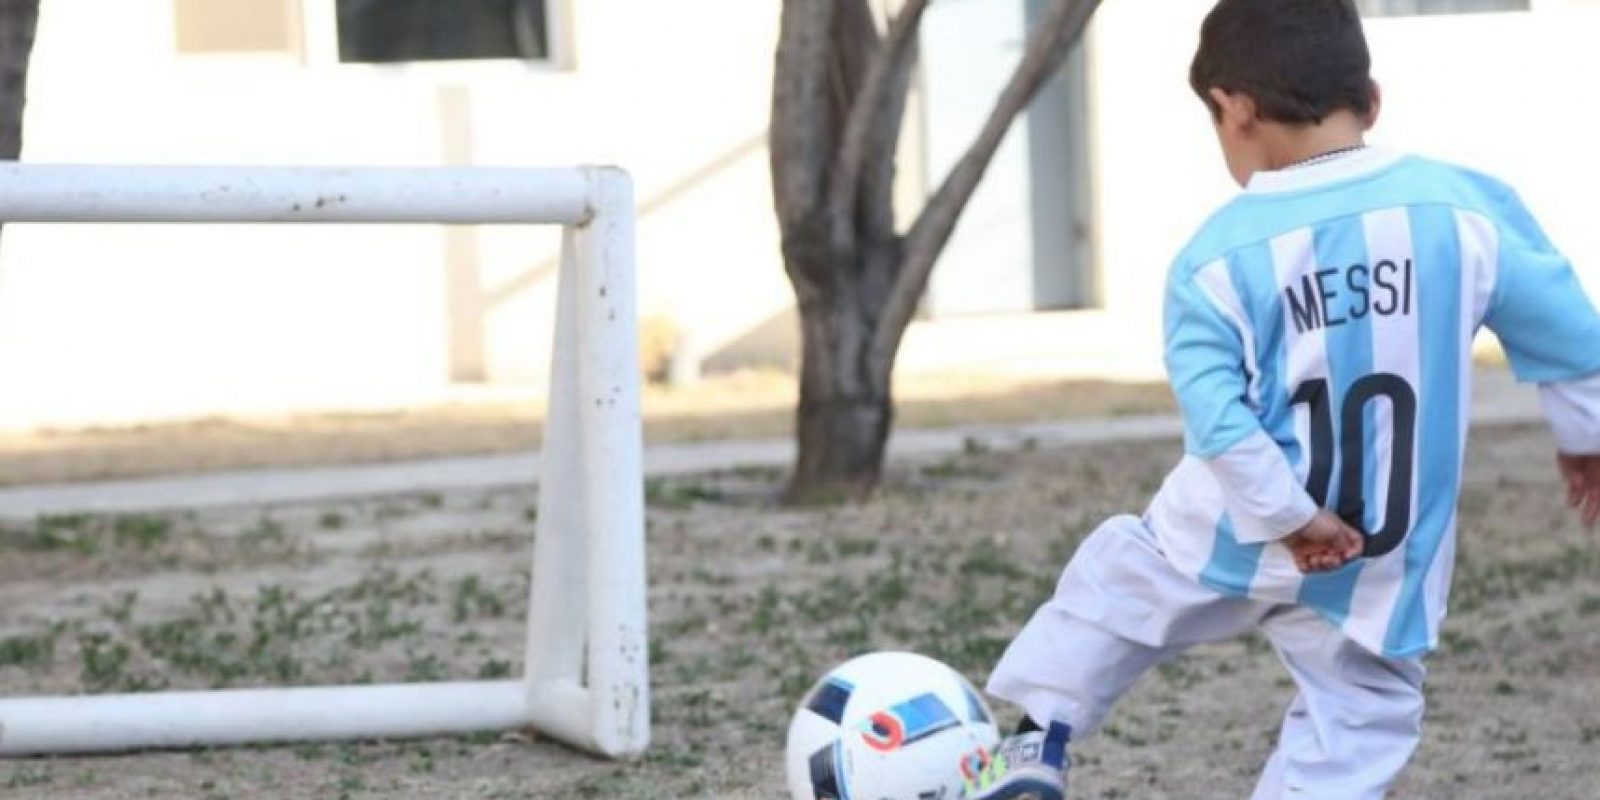 El pequeño afgano se mostró feliz Foto:facebook.com/afghanistanunicef/